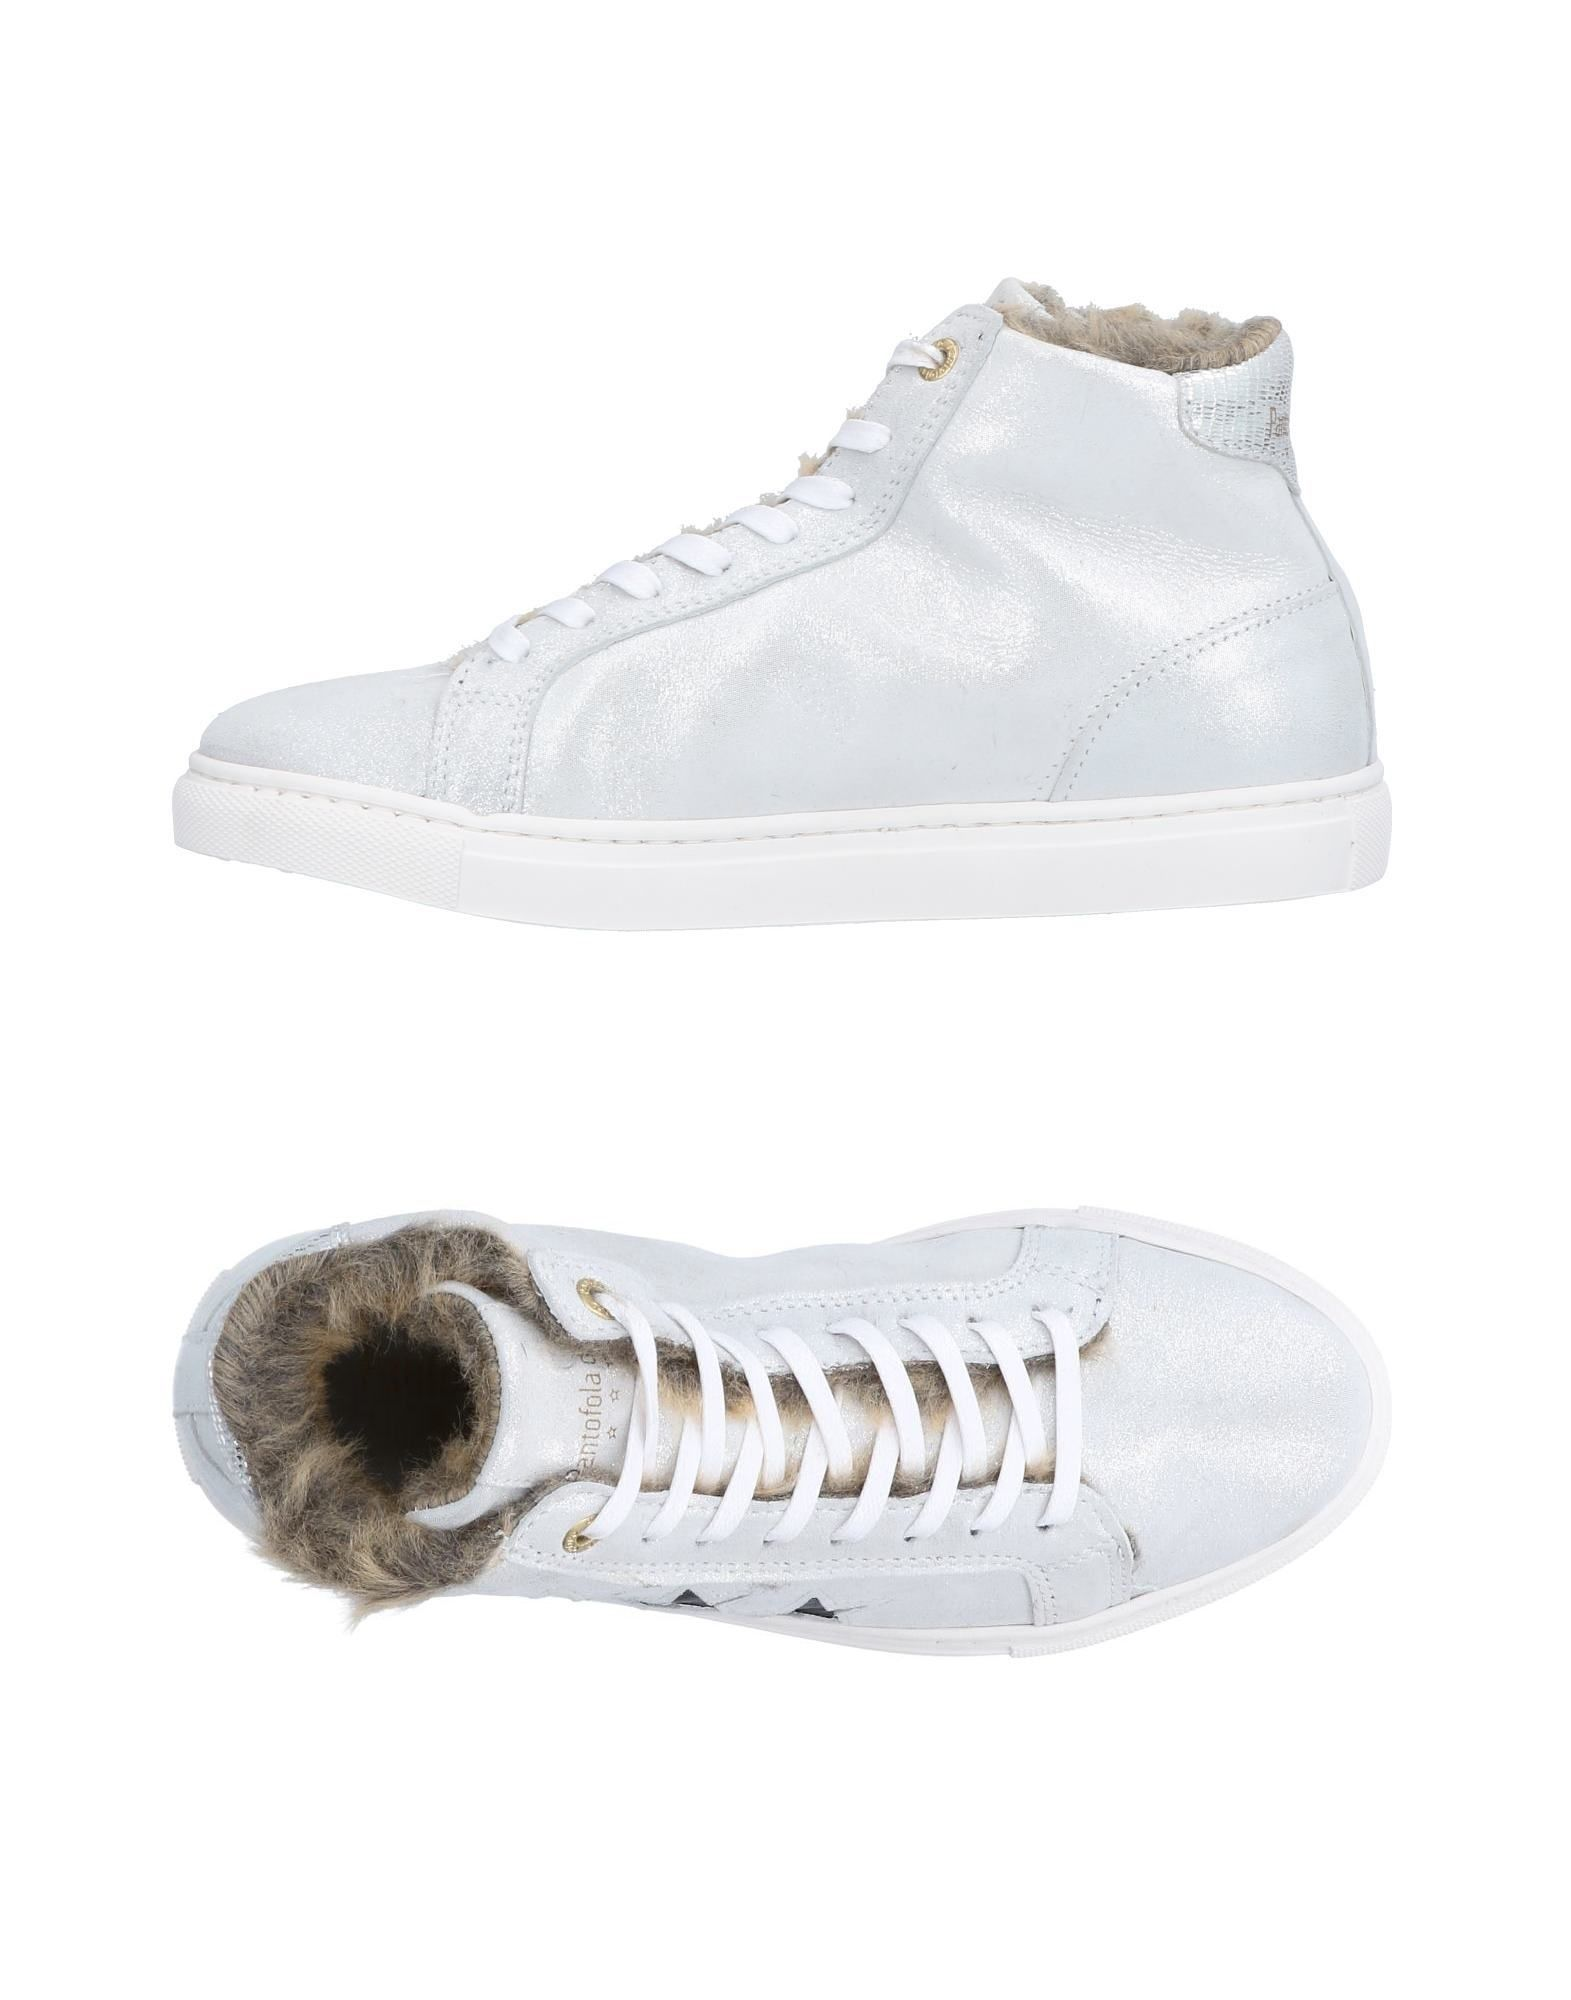 Pantofola D'oro Sneakers Damen Gutes Preis-Leistungs-Verhältnis, es lohnt sich 4355